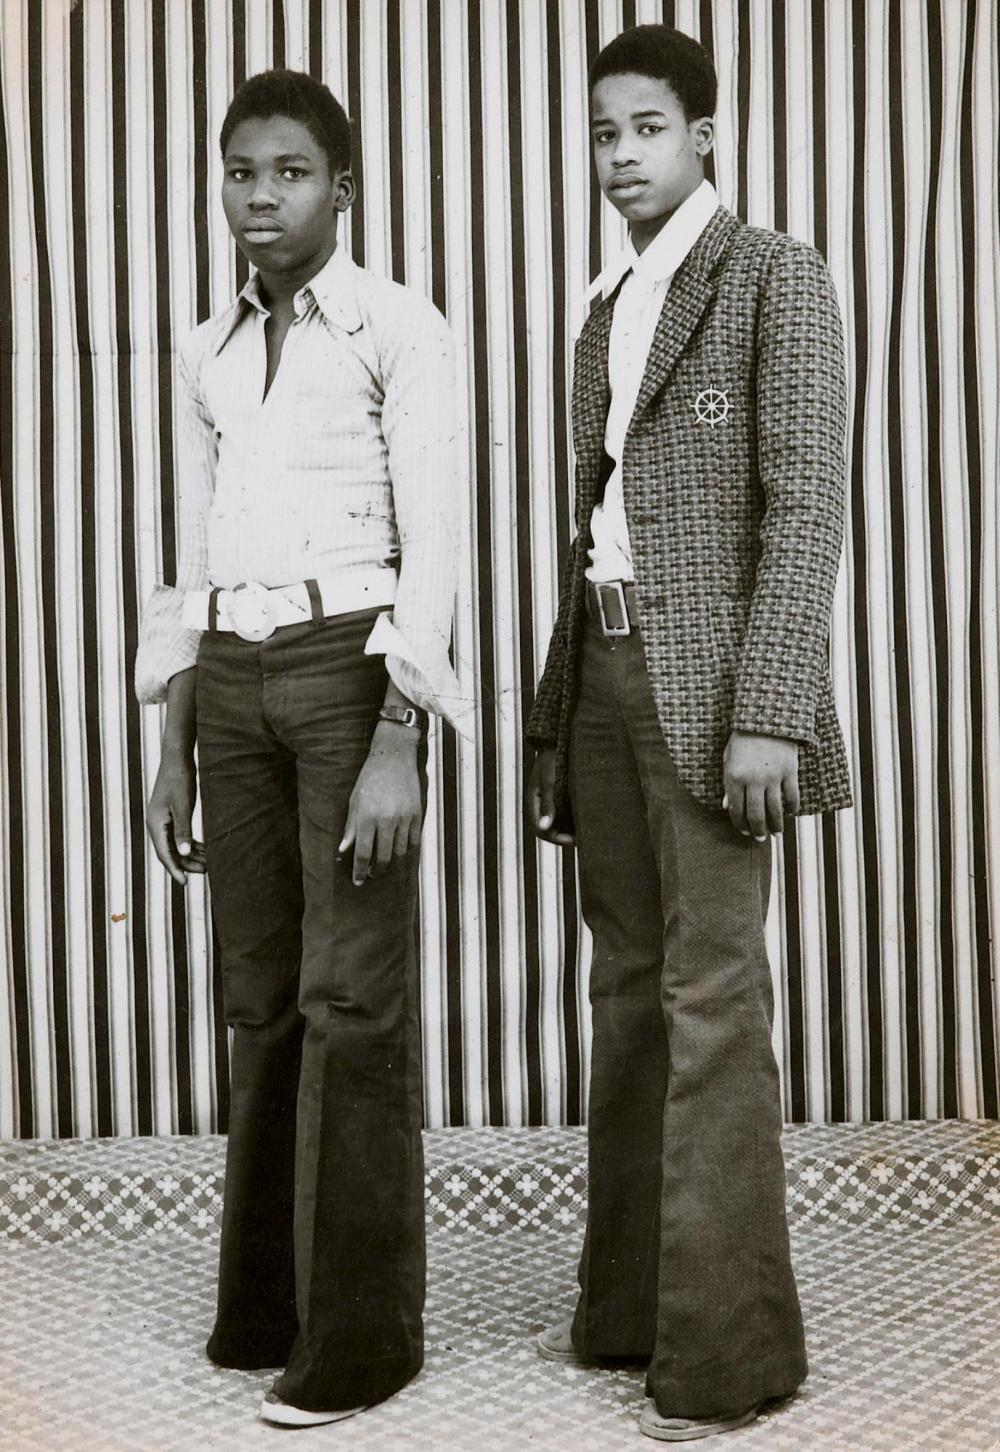 MALICK SIDIBÉ | Untitled (Deux jeunes hommes)